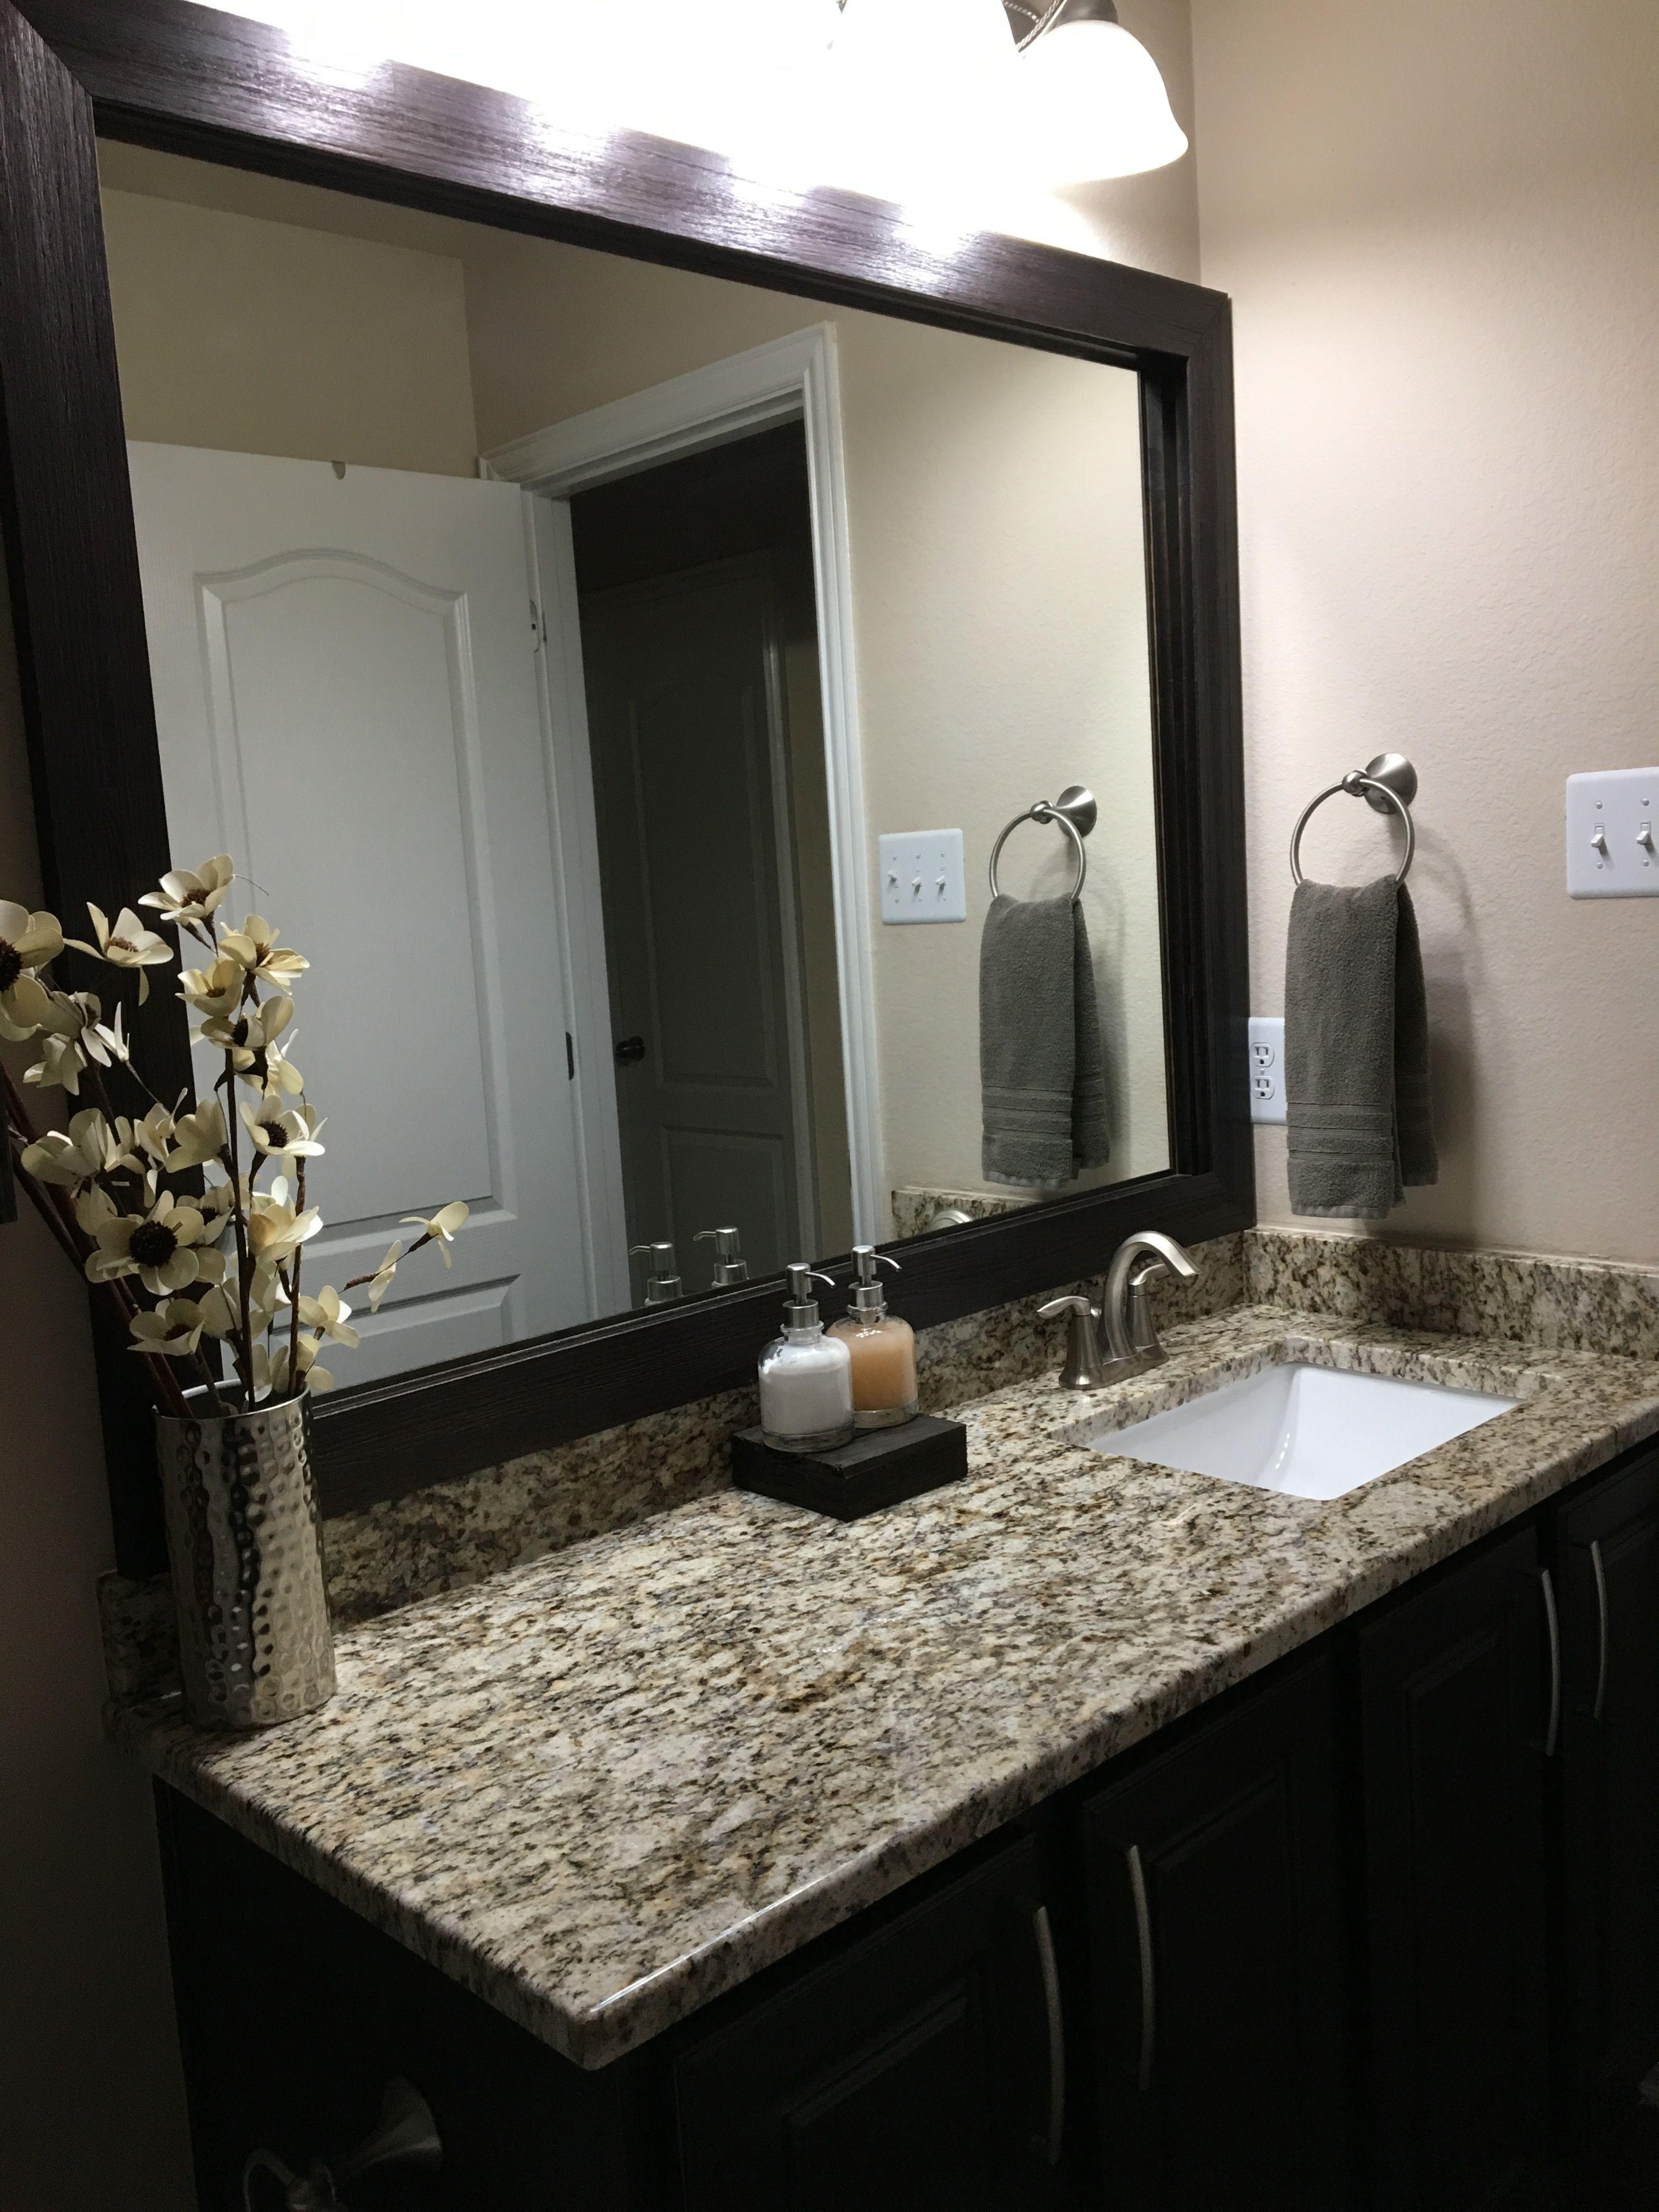 Eberhart Salle De Bain santa cecilia granite and dark cabinets - bathroom (with